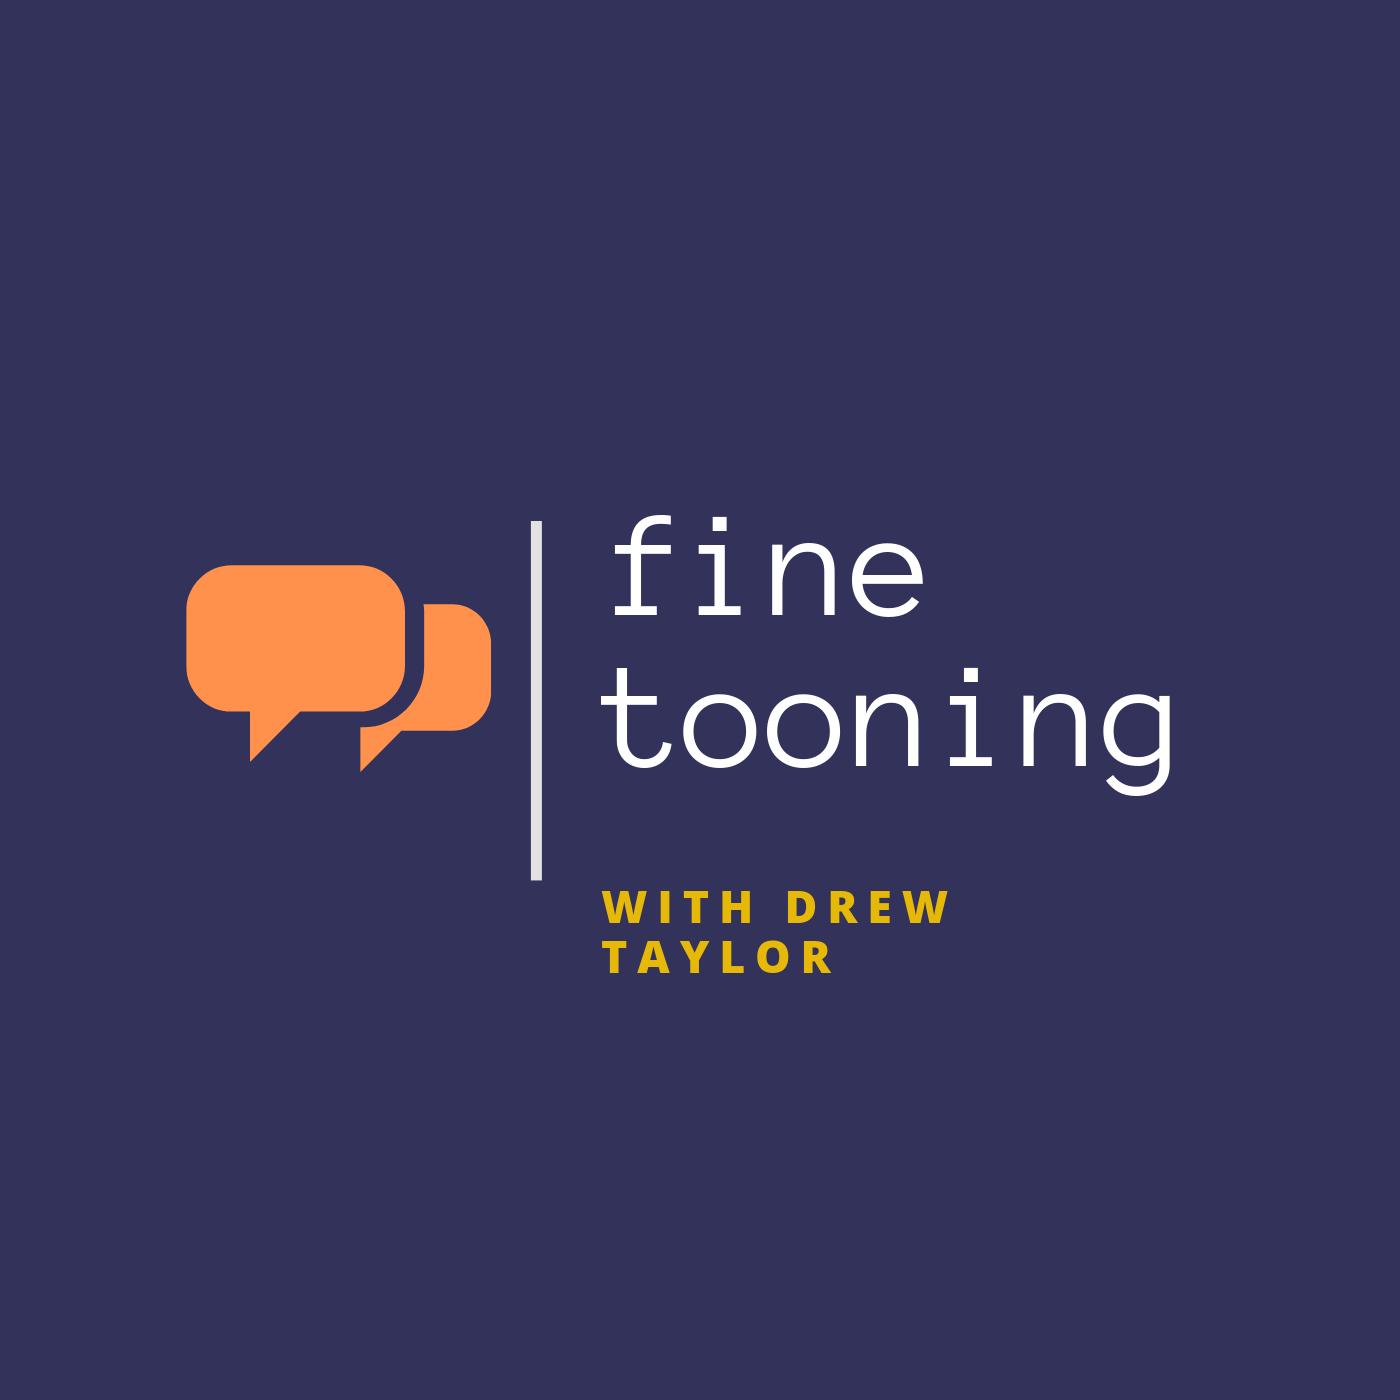 Fine Tooning